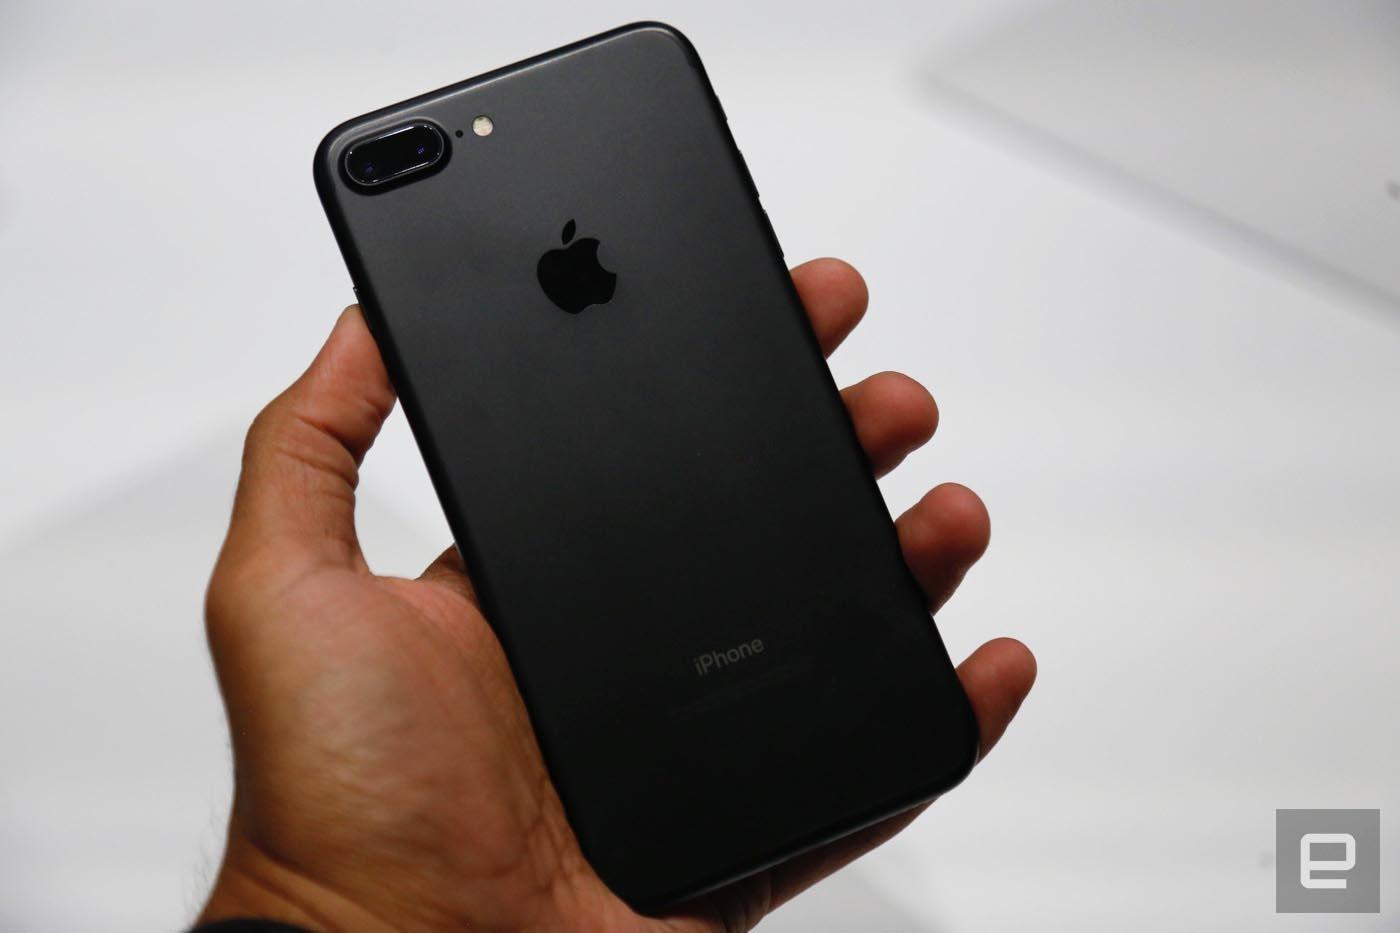 consomac les premi res images des iphone 7 noirs. Black Bedroom Furniture Sets. Home Design Ideas